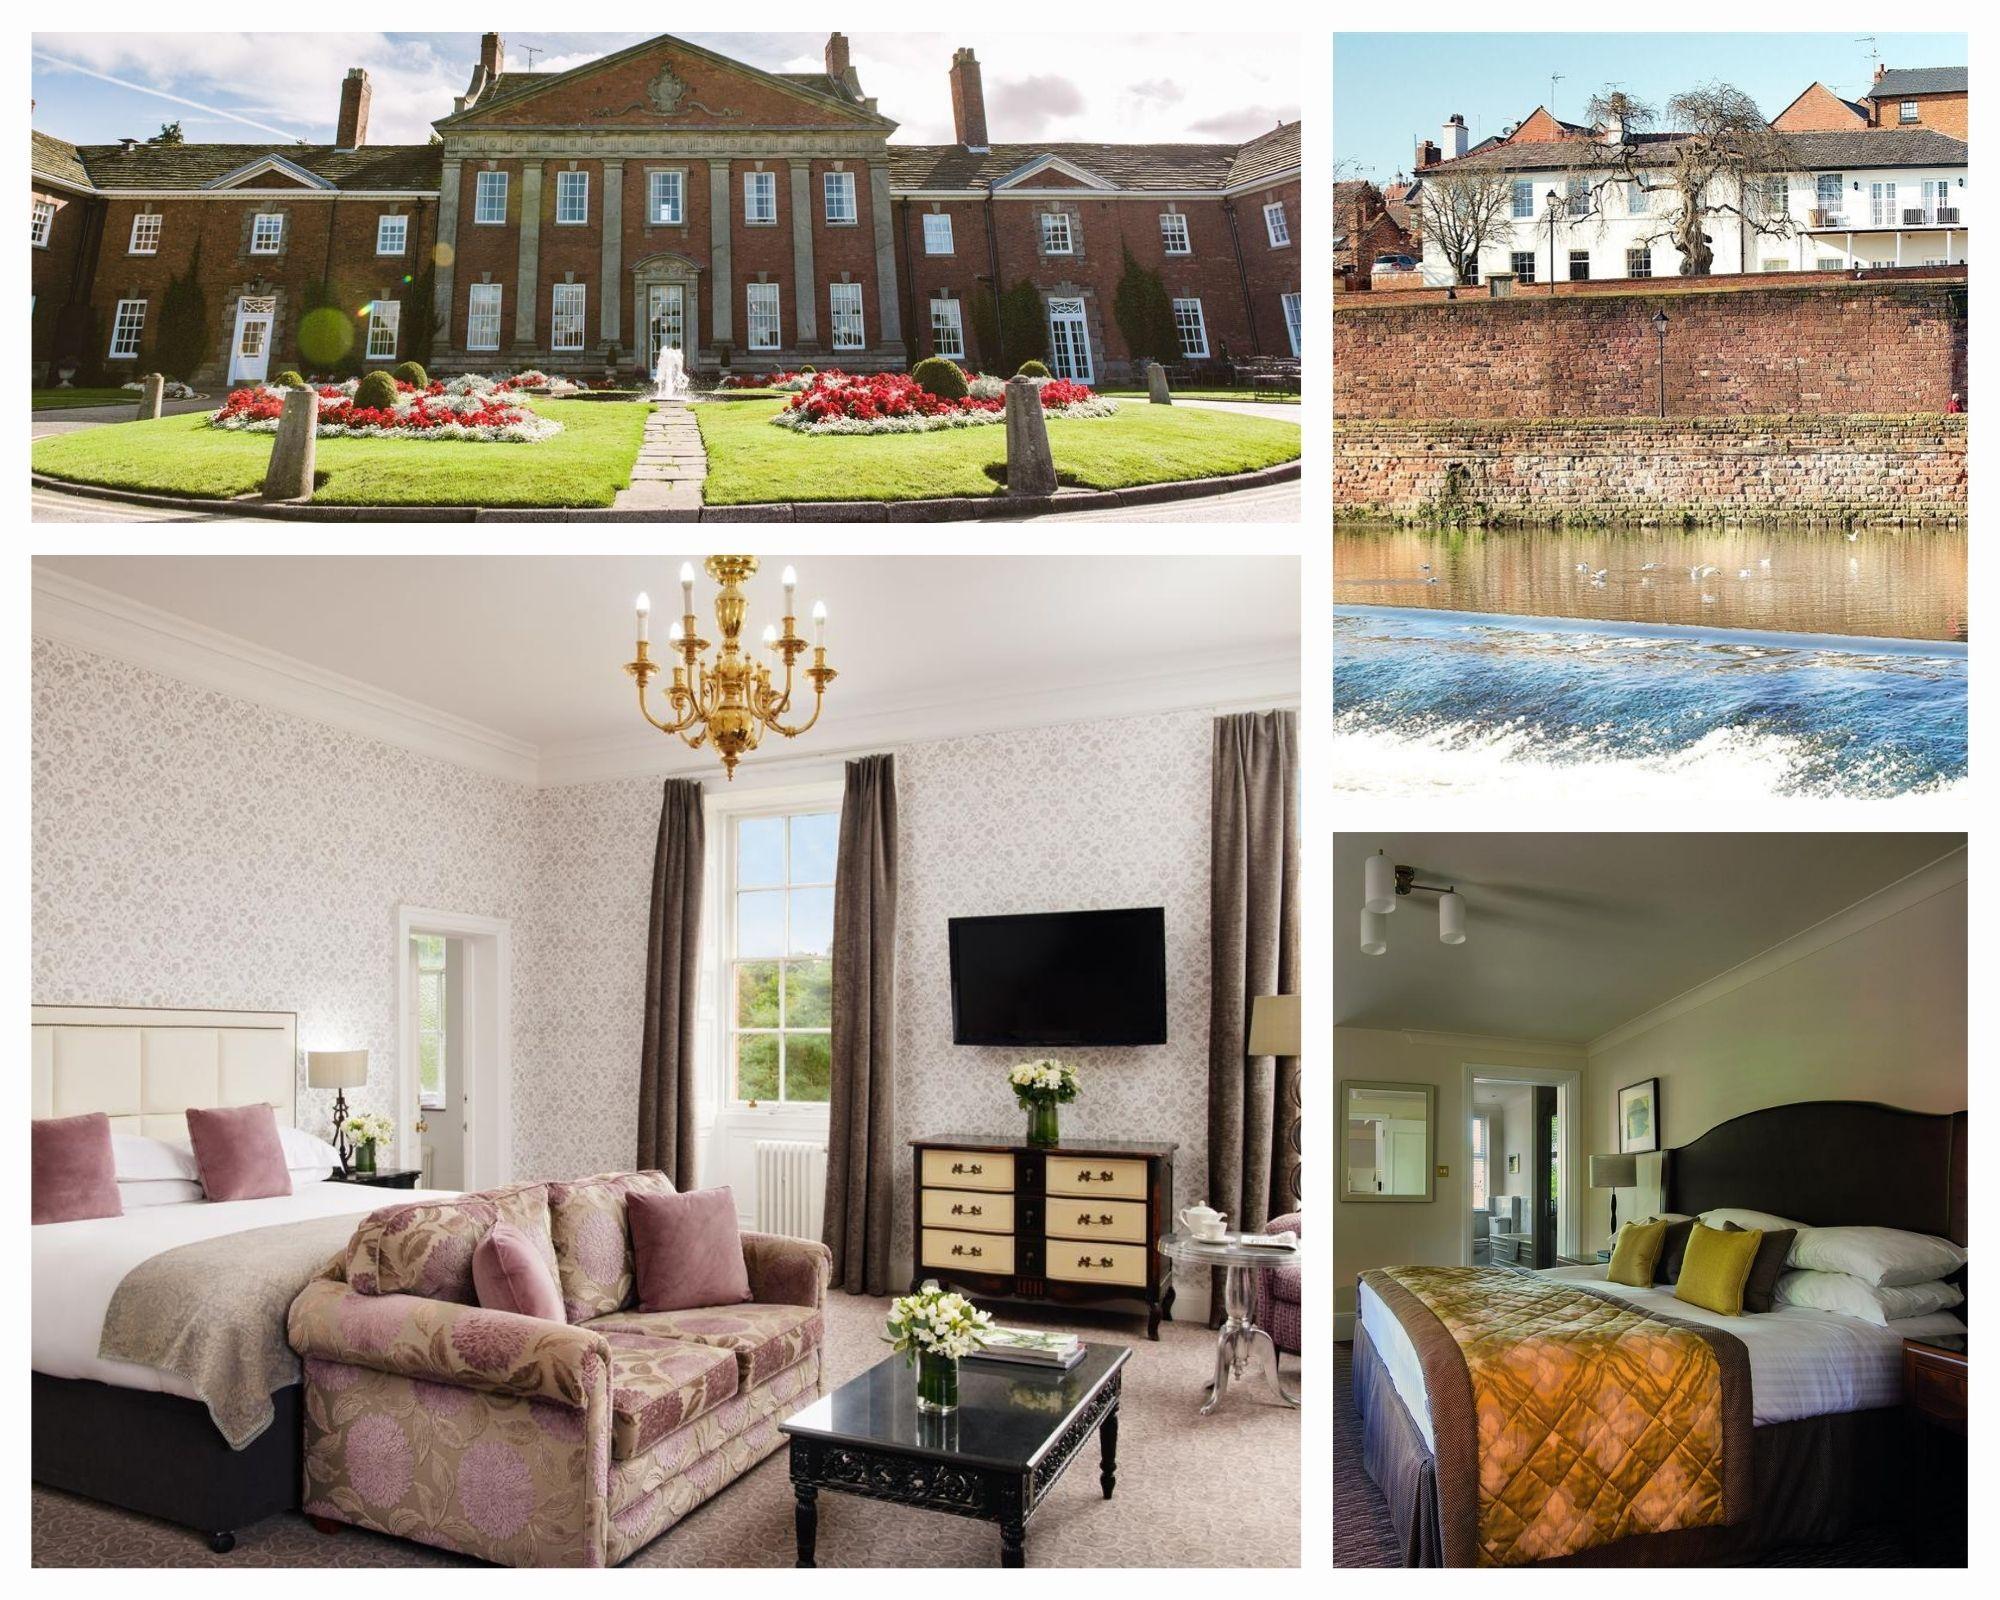 A look inside five popular hotels on Warrington's doorstep